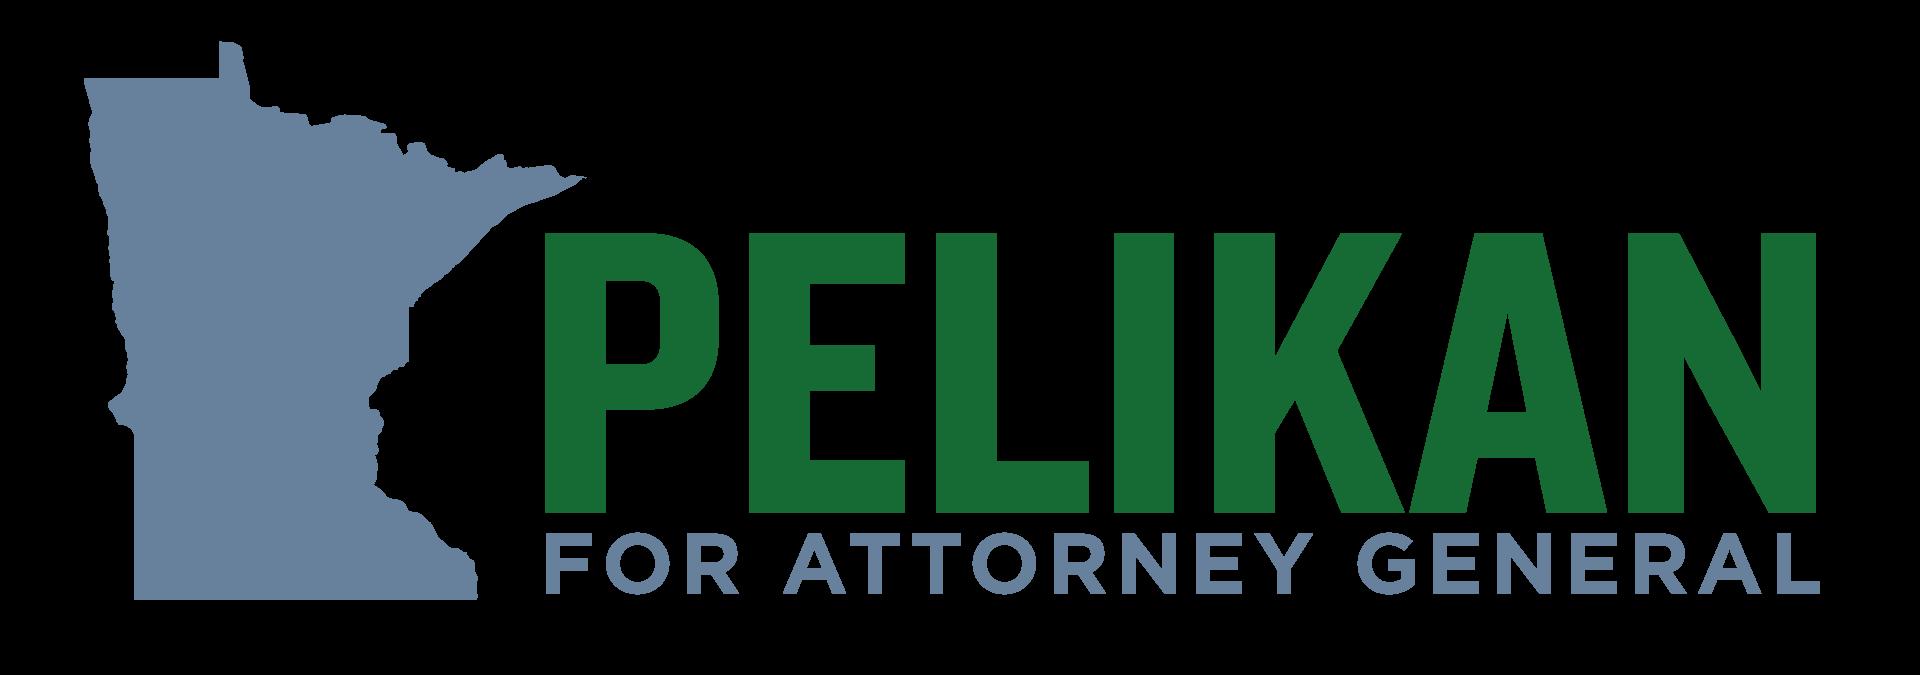 Matt Pelikan for Minnesota Attorney General